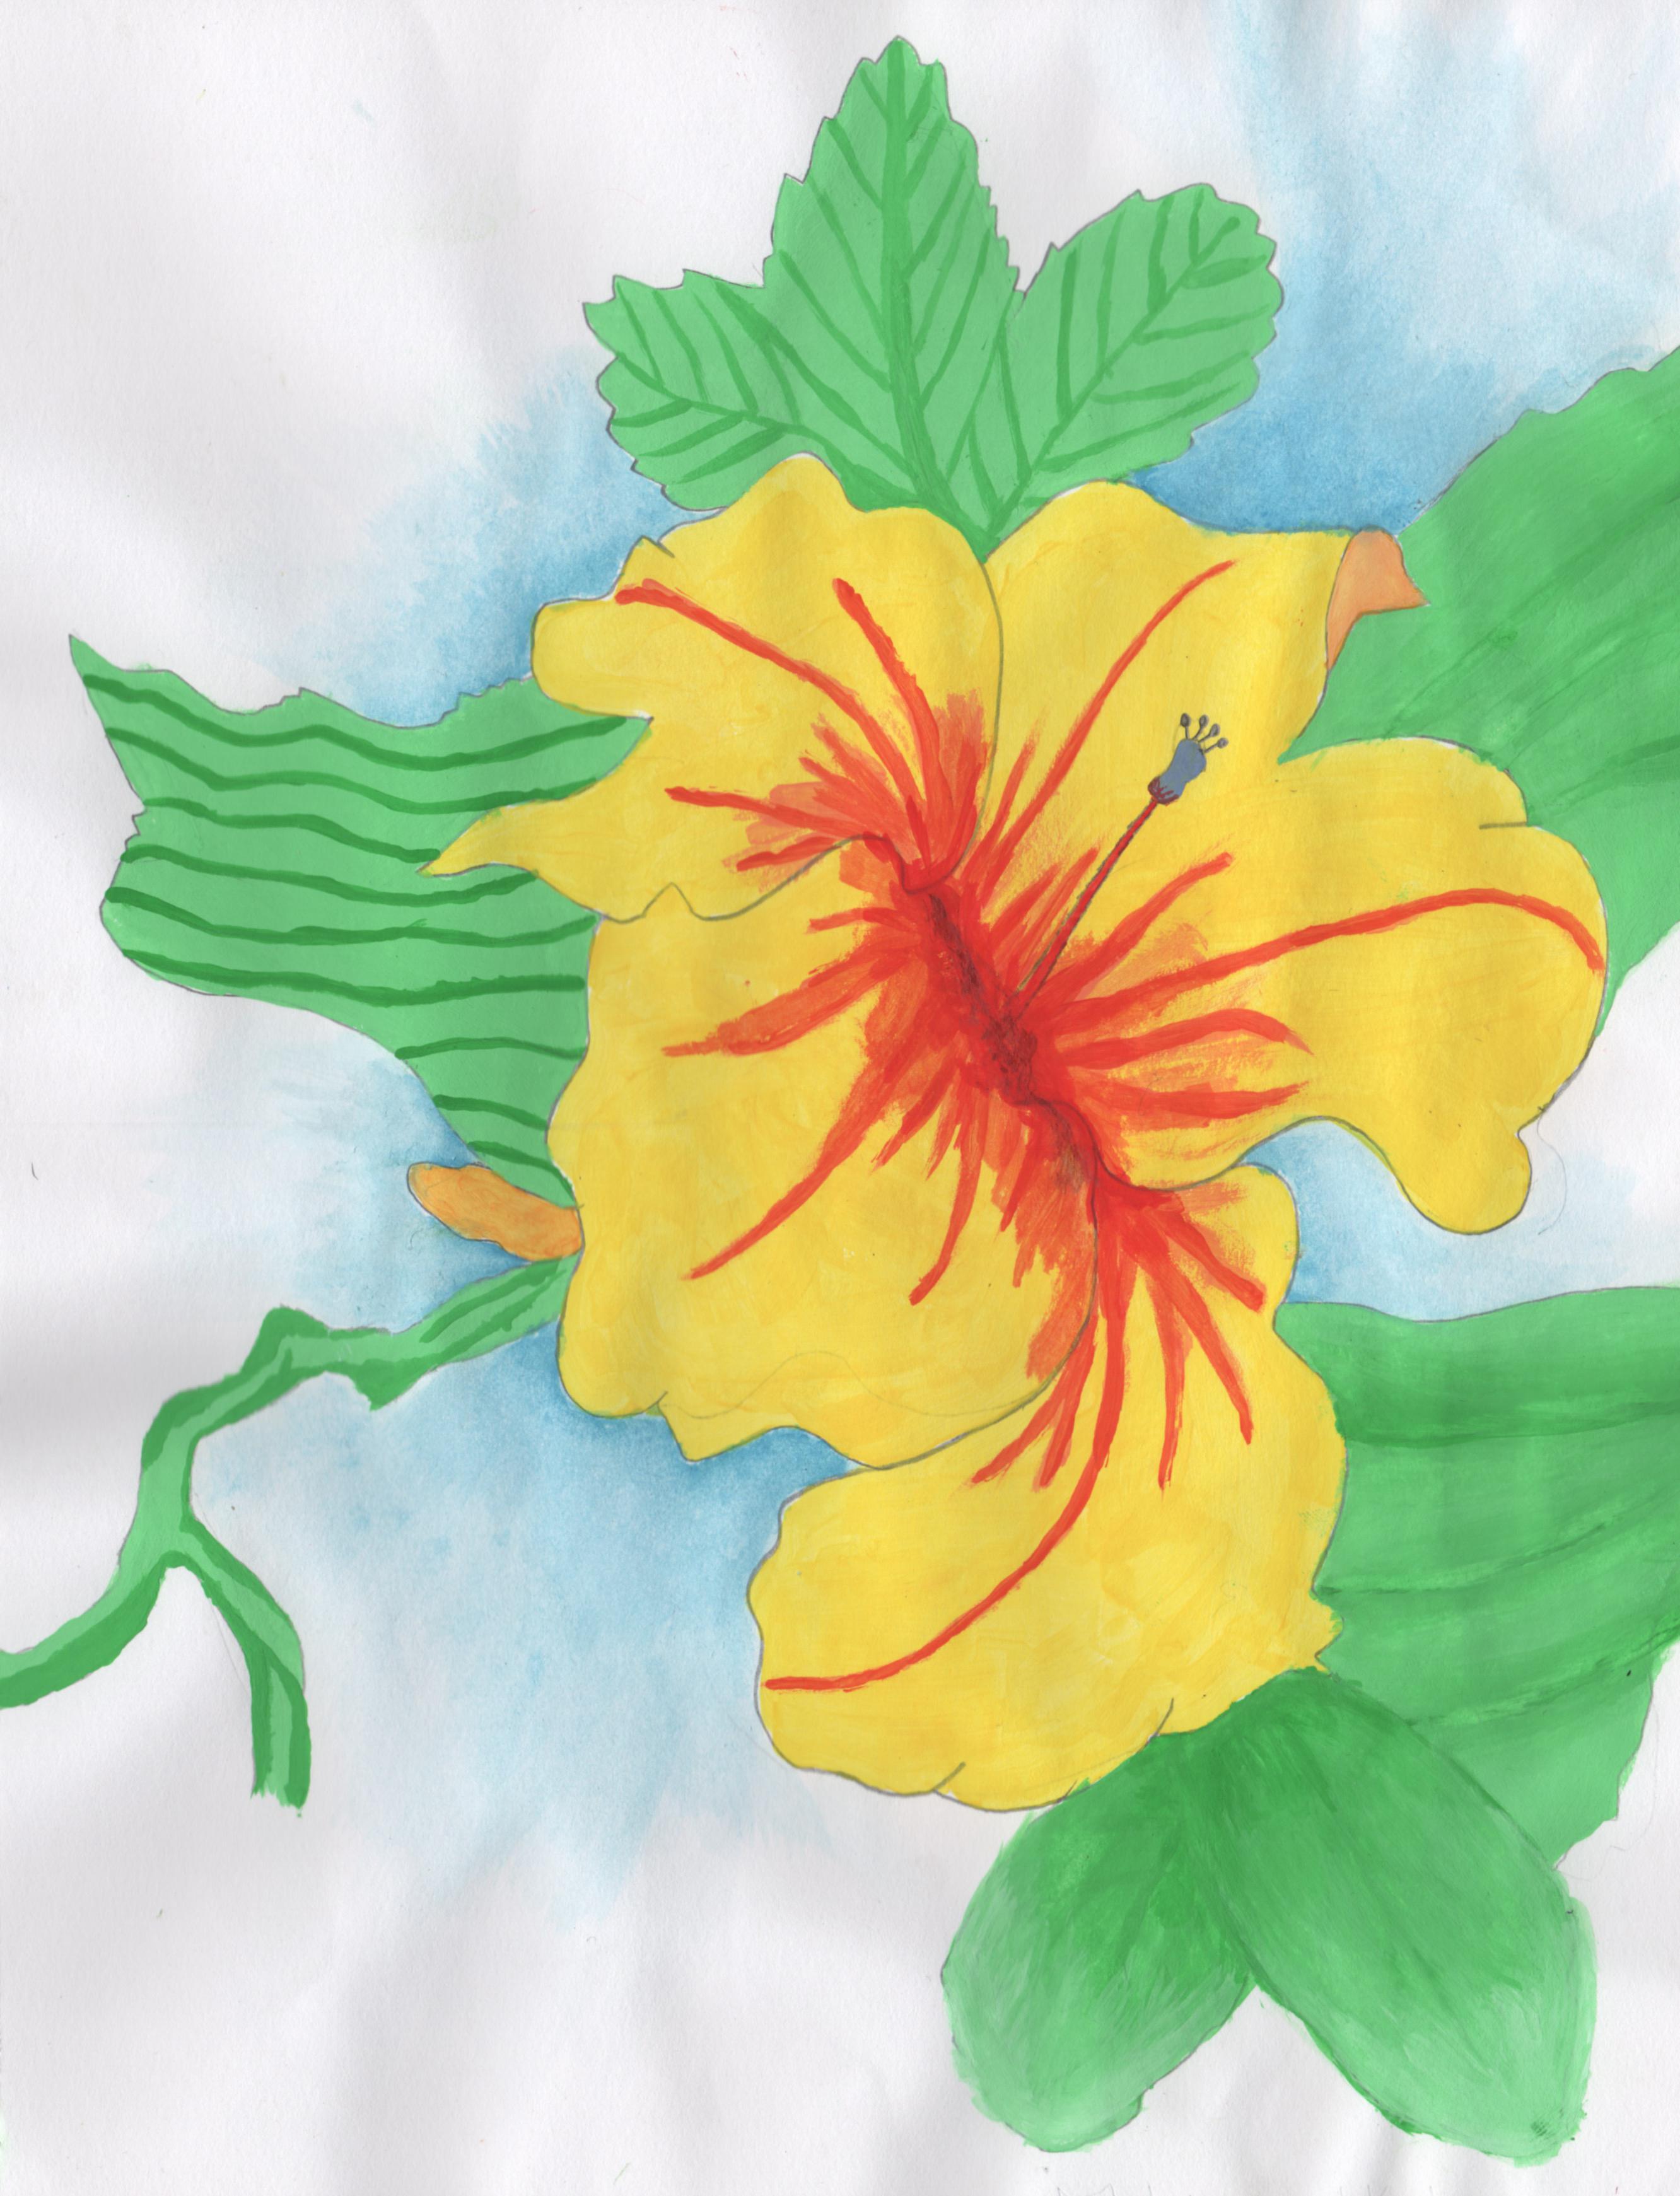 Flower_MuhammadK_01